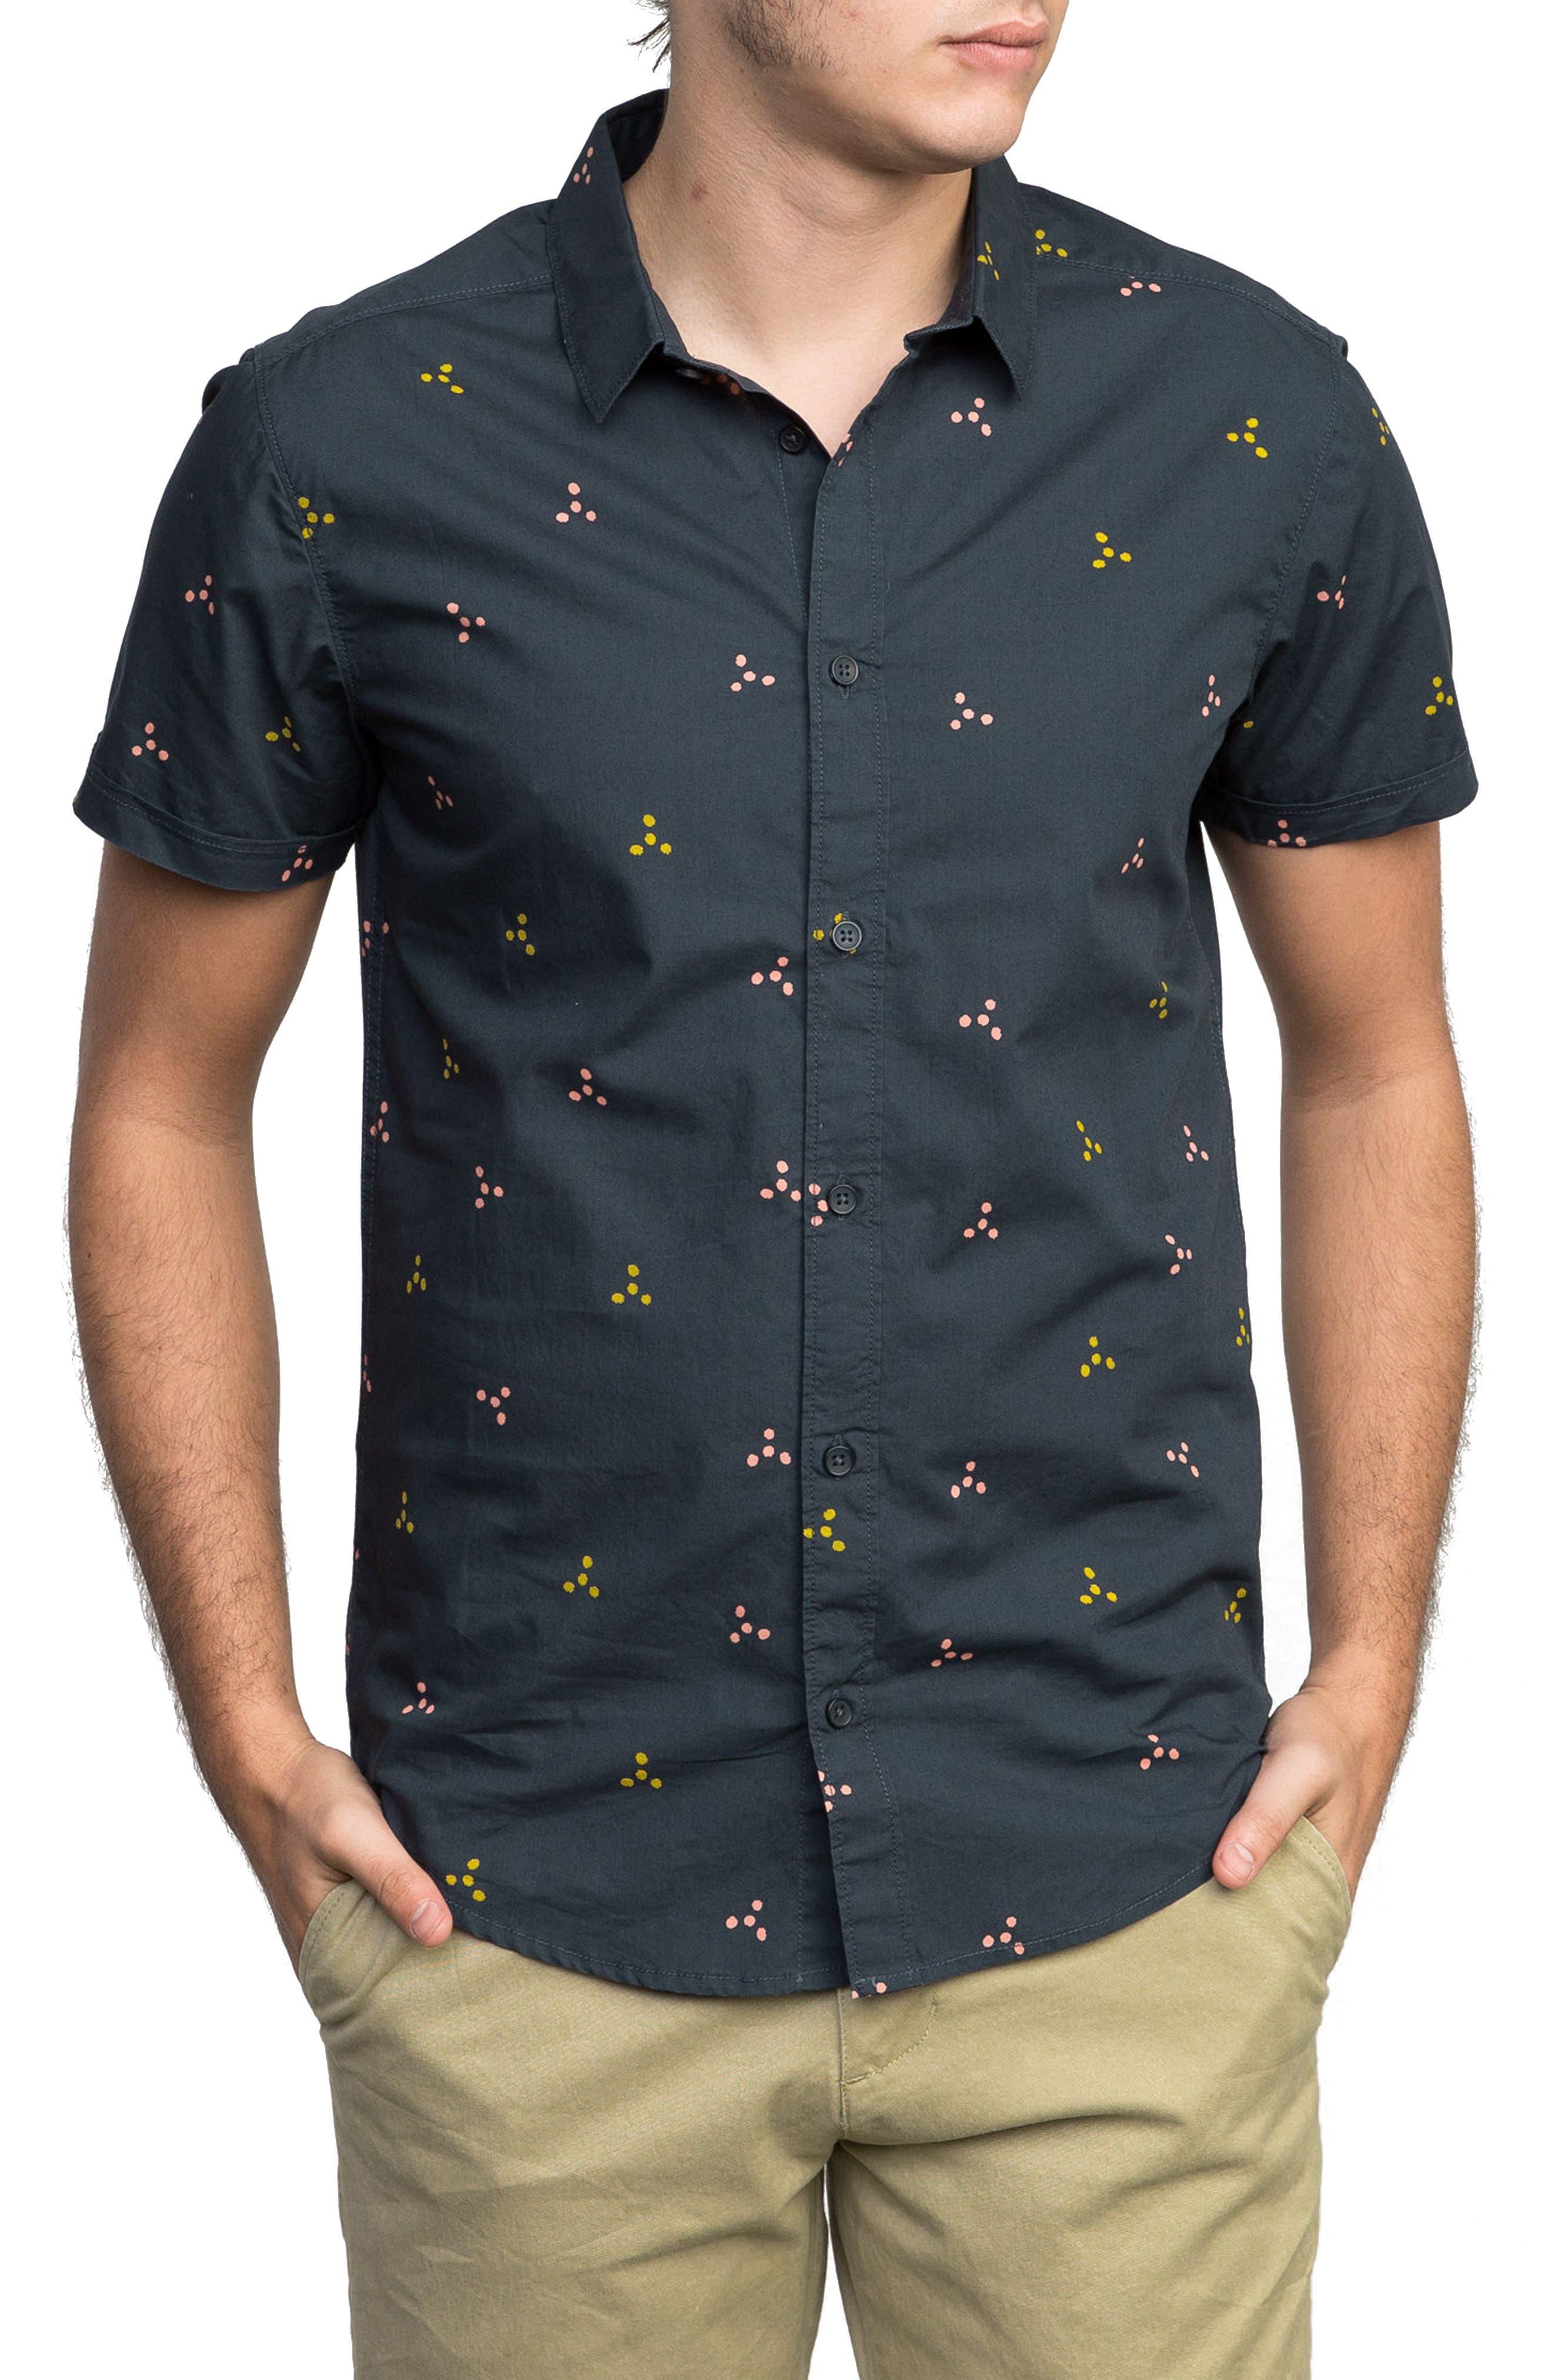 Tridot Woven Shirt,                         Main,                         color, 020